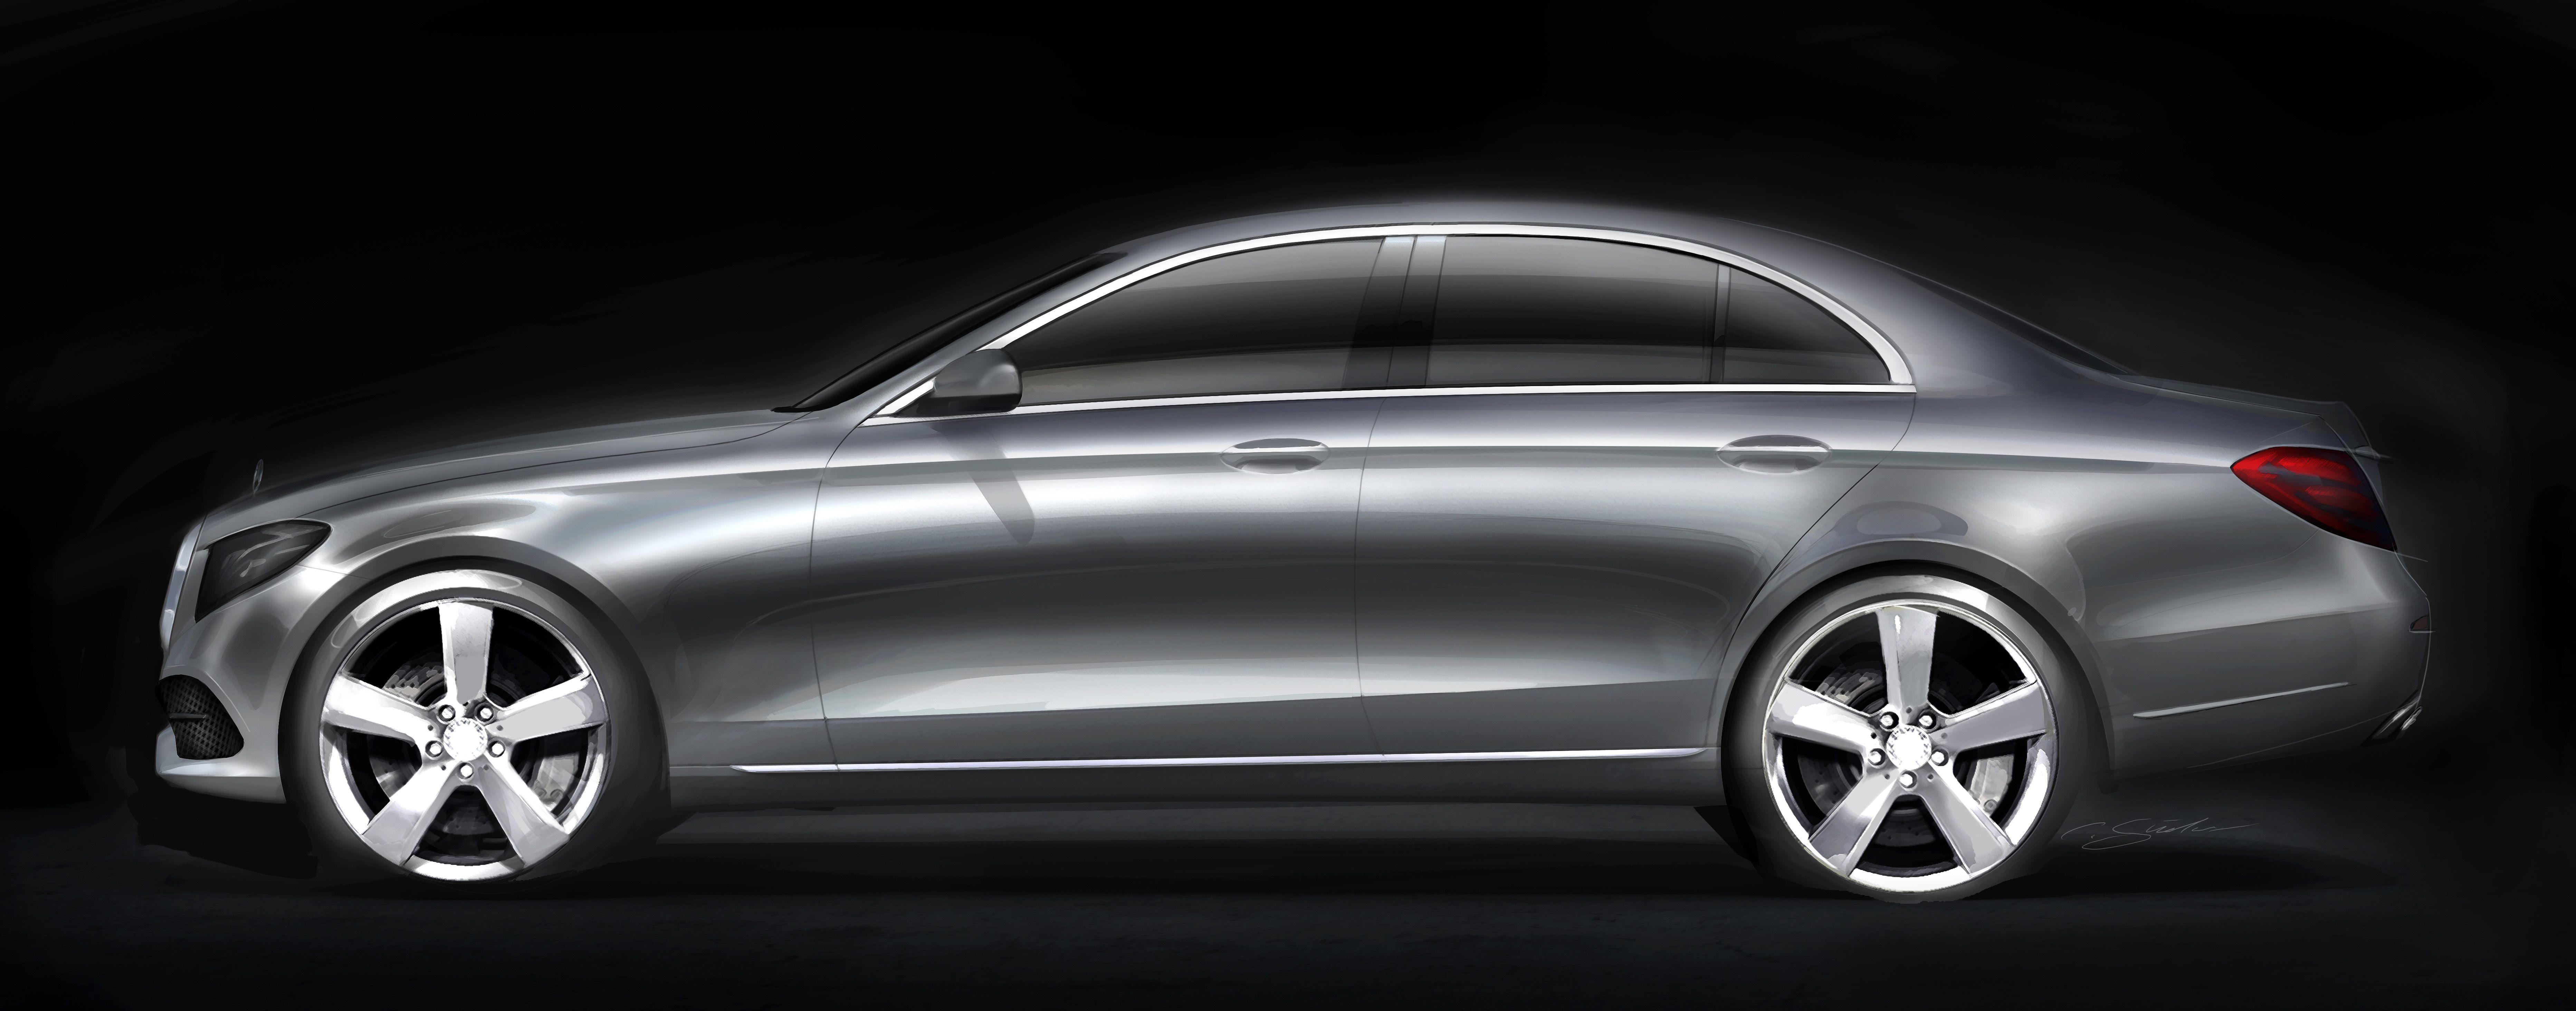 Mercedes Benz E Class Mercedes Benz Benz E Class Benz